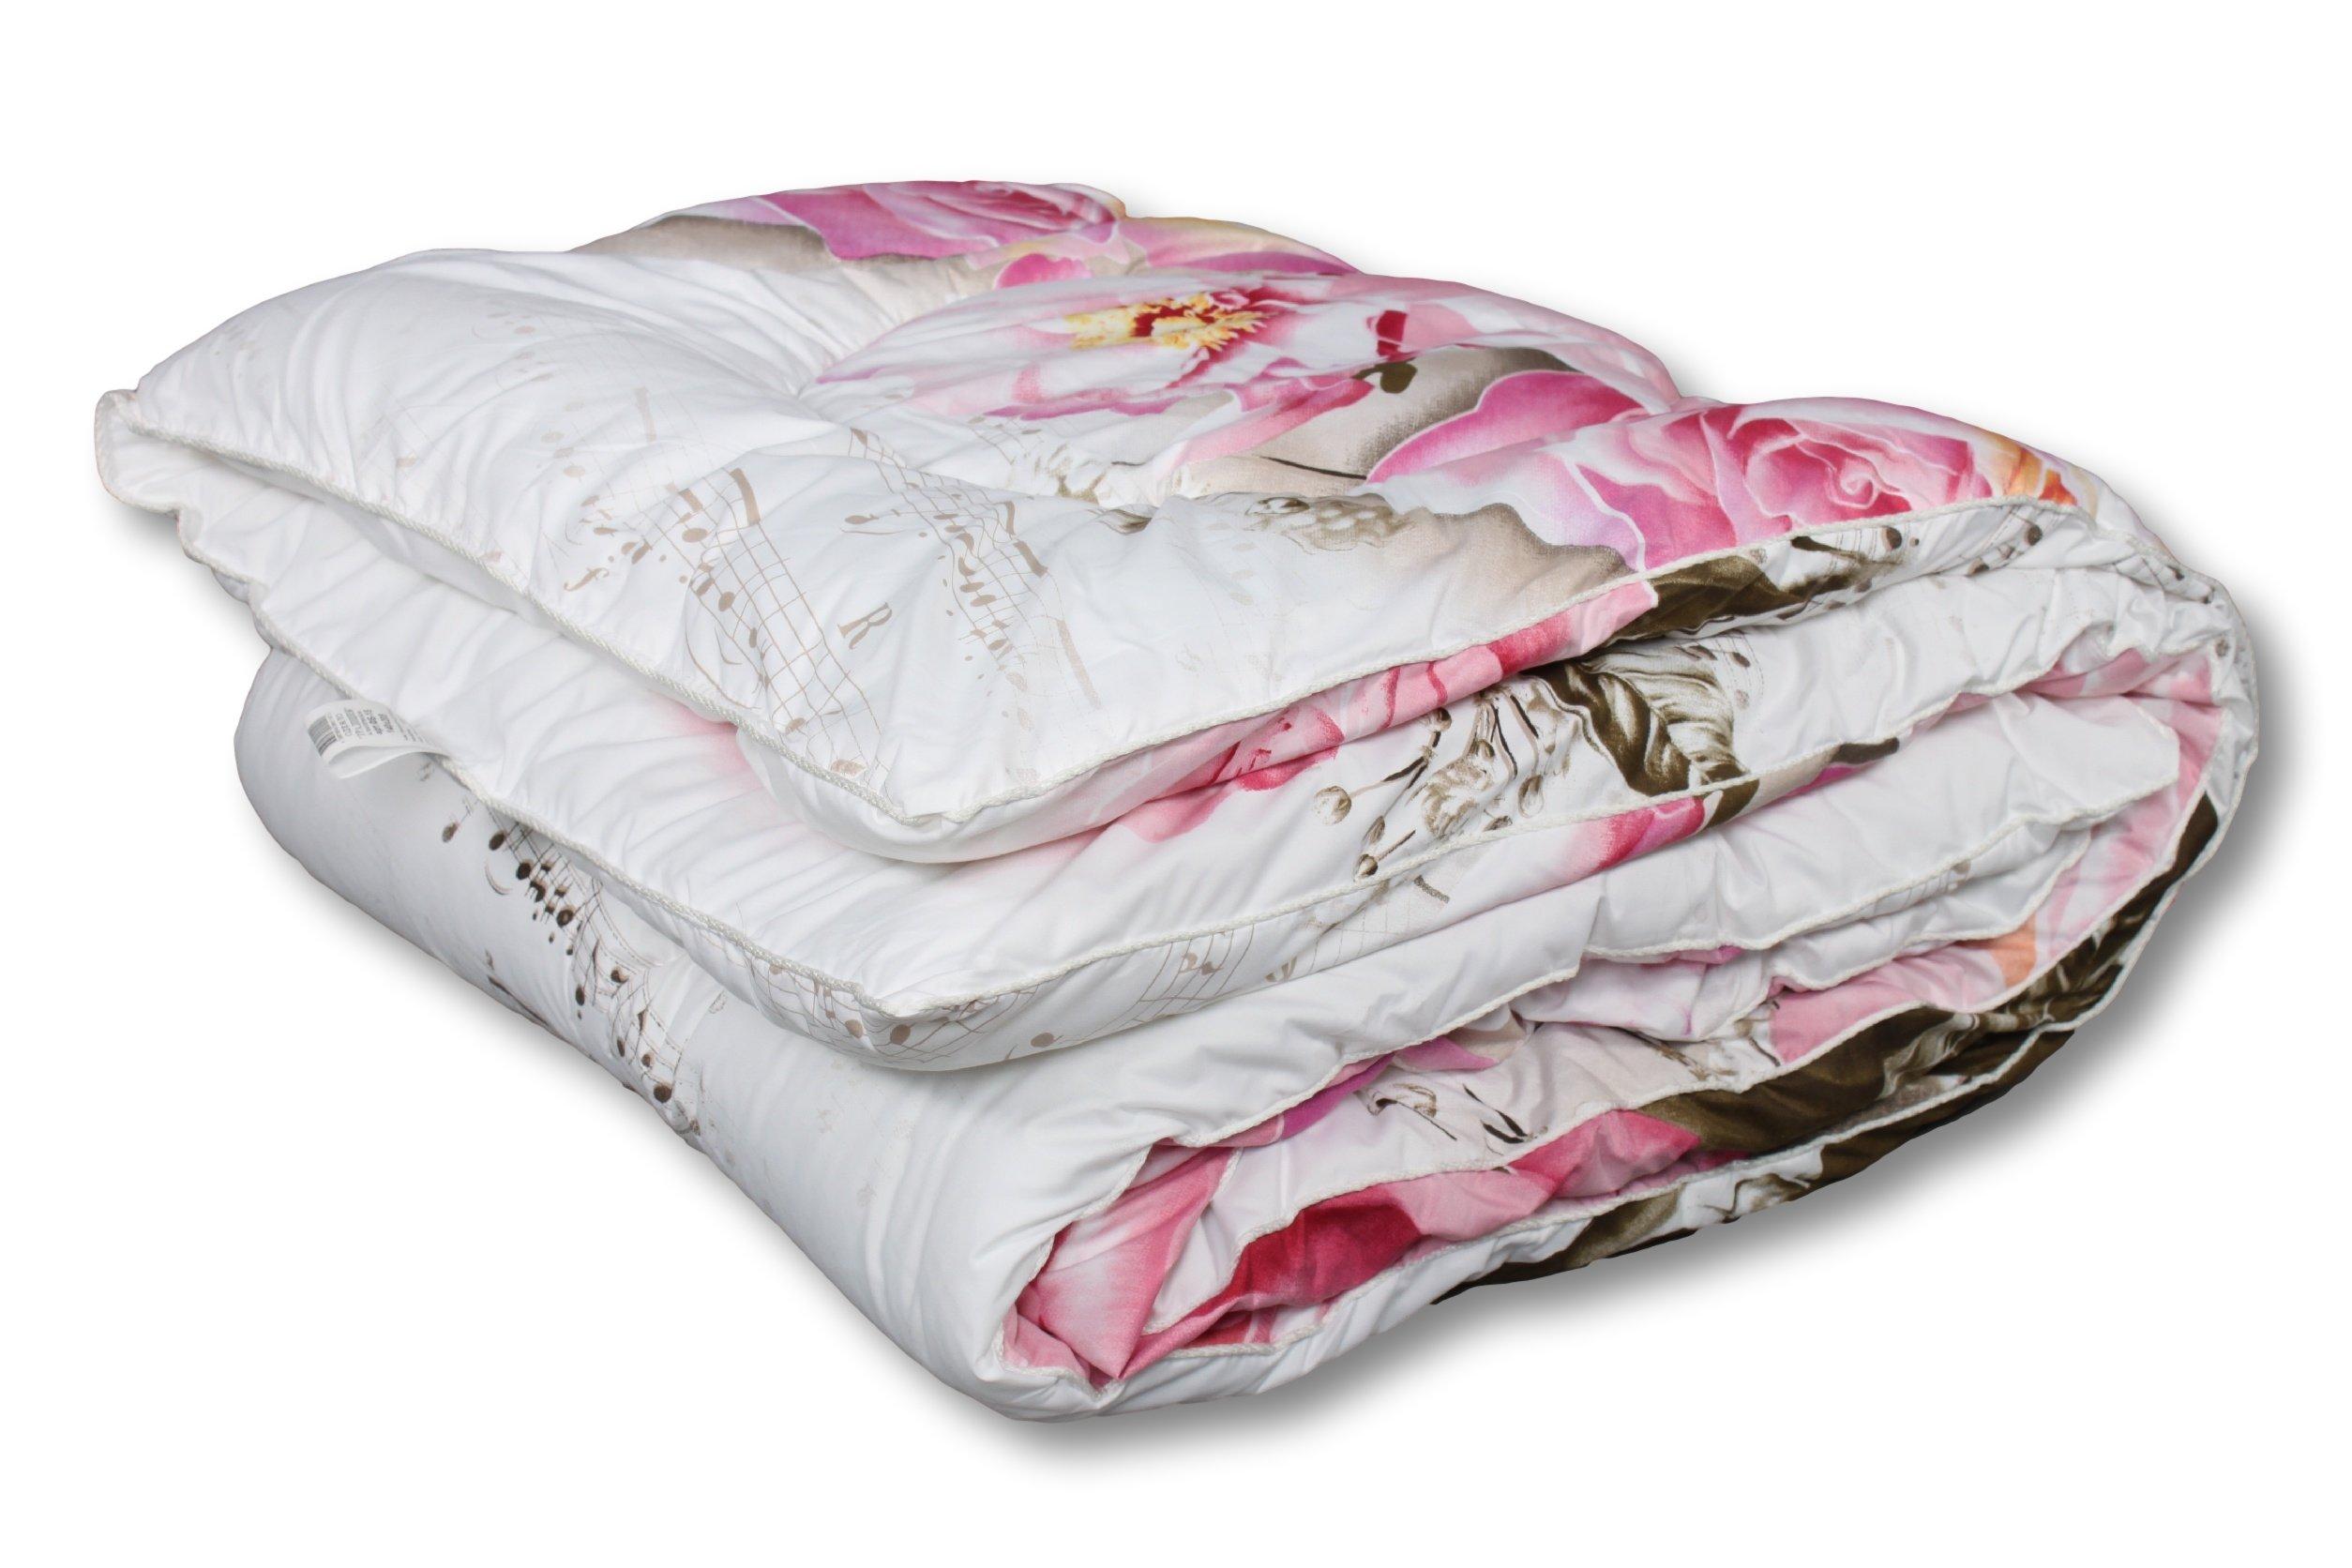 Одеяло ФБ-15 140х205 классическое